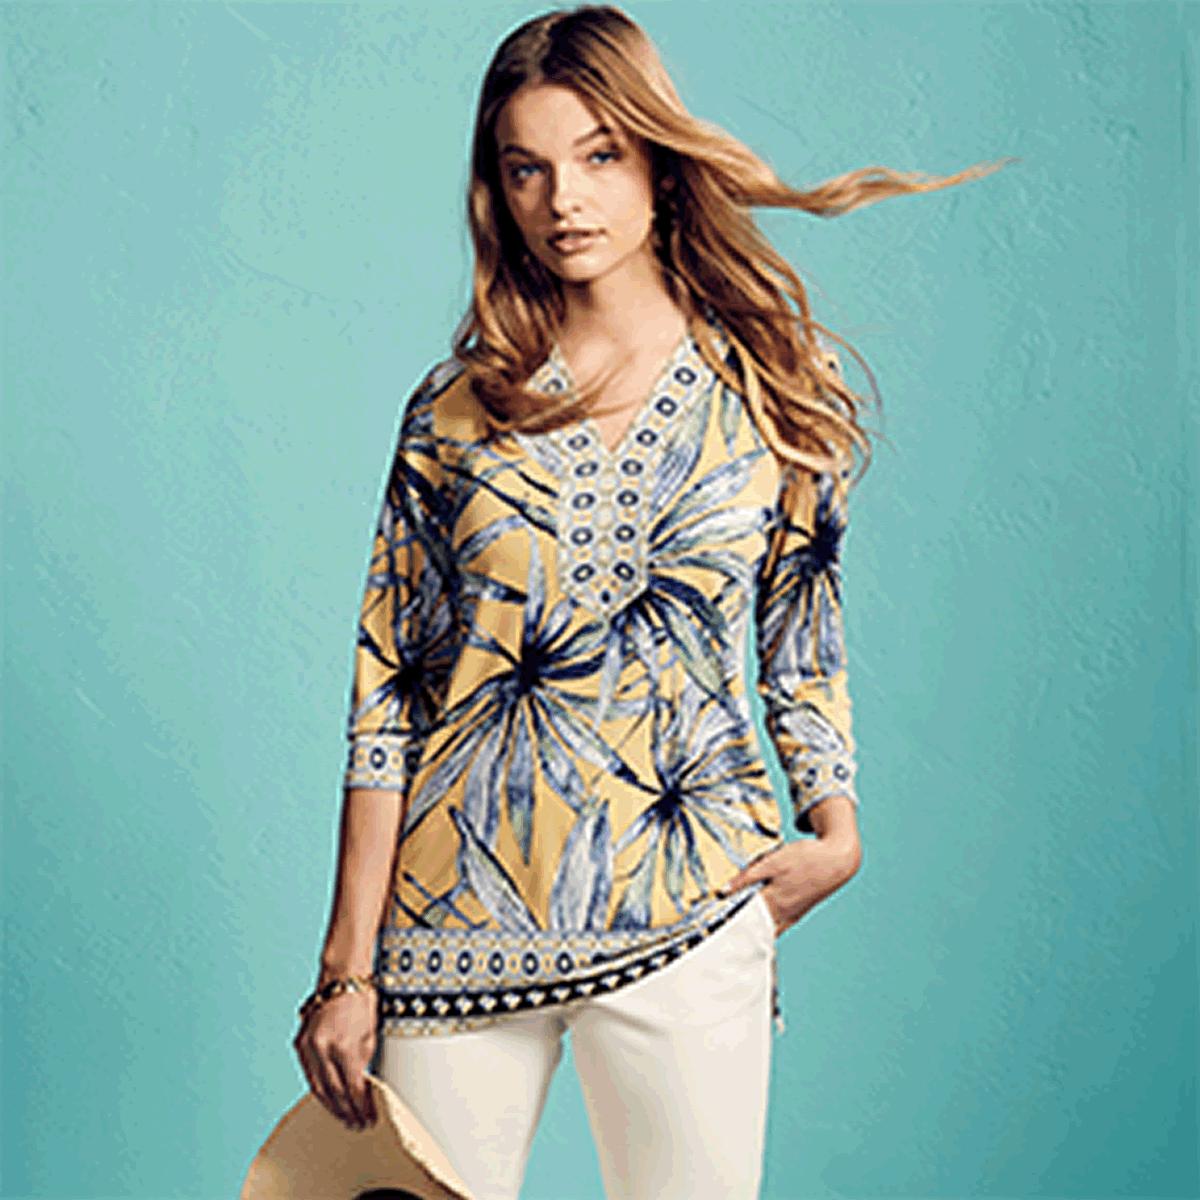 Petite Clothing - Petite Women\'s Clothing & Fashion - Macy\'s